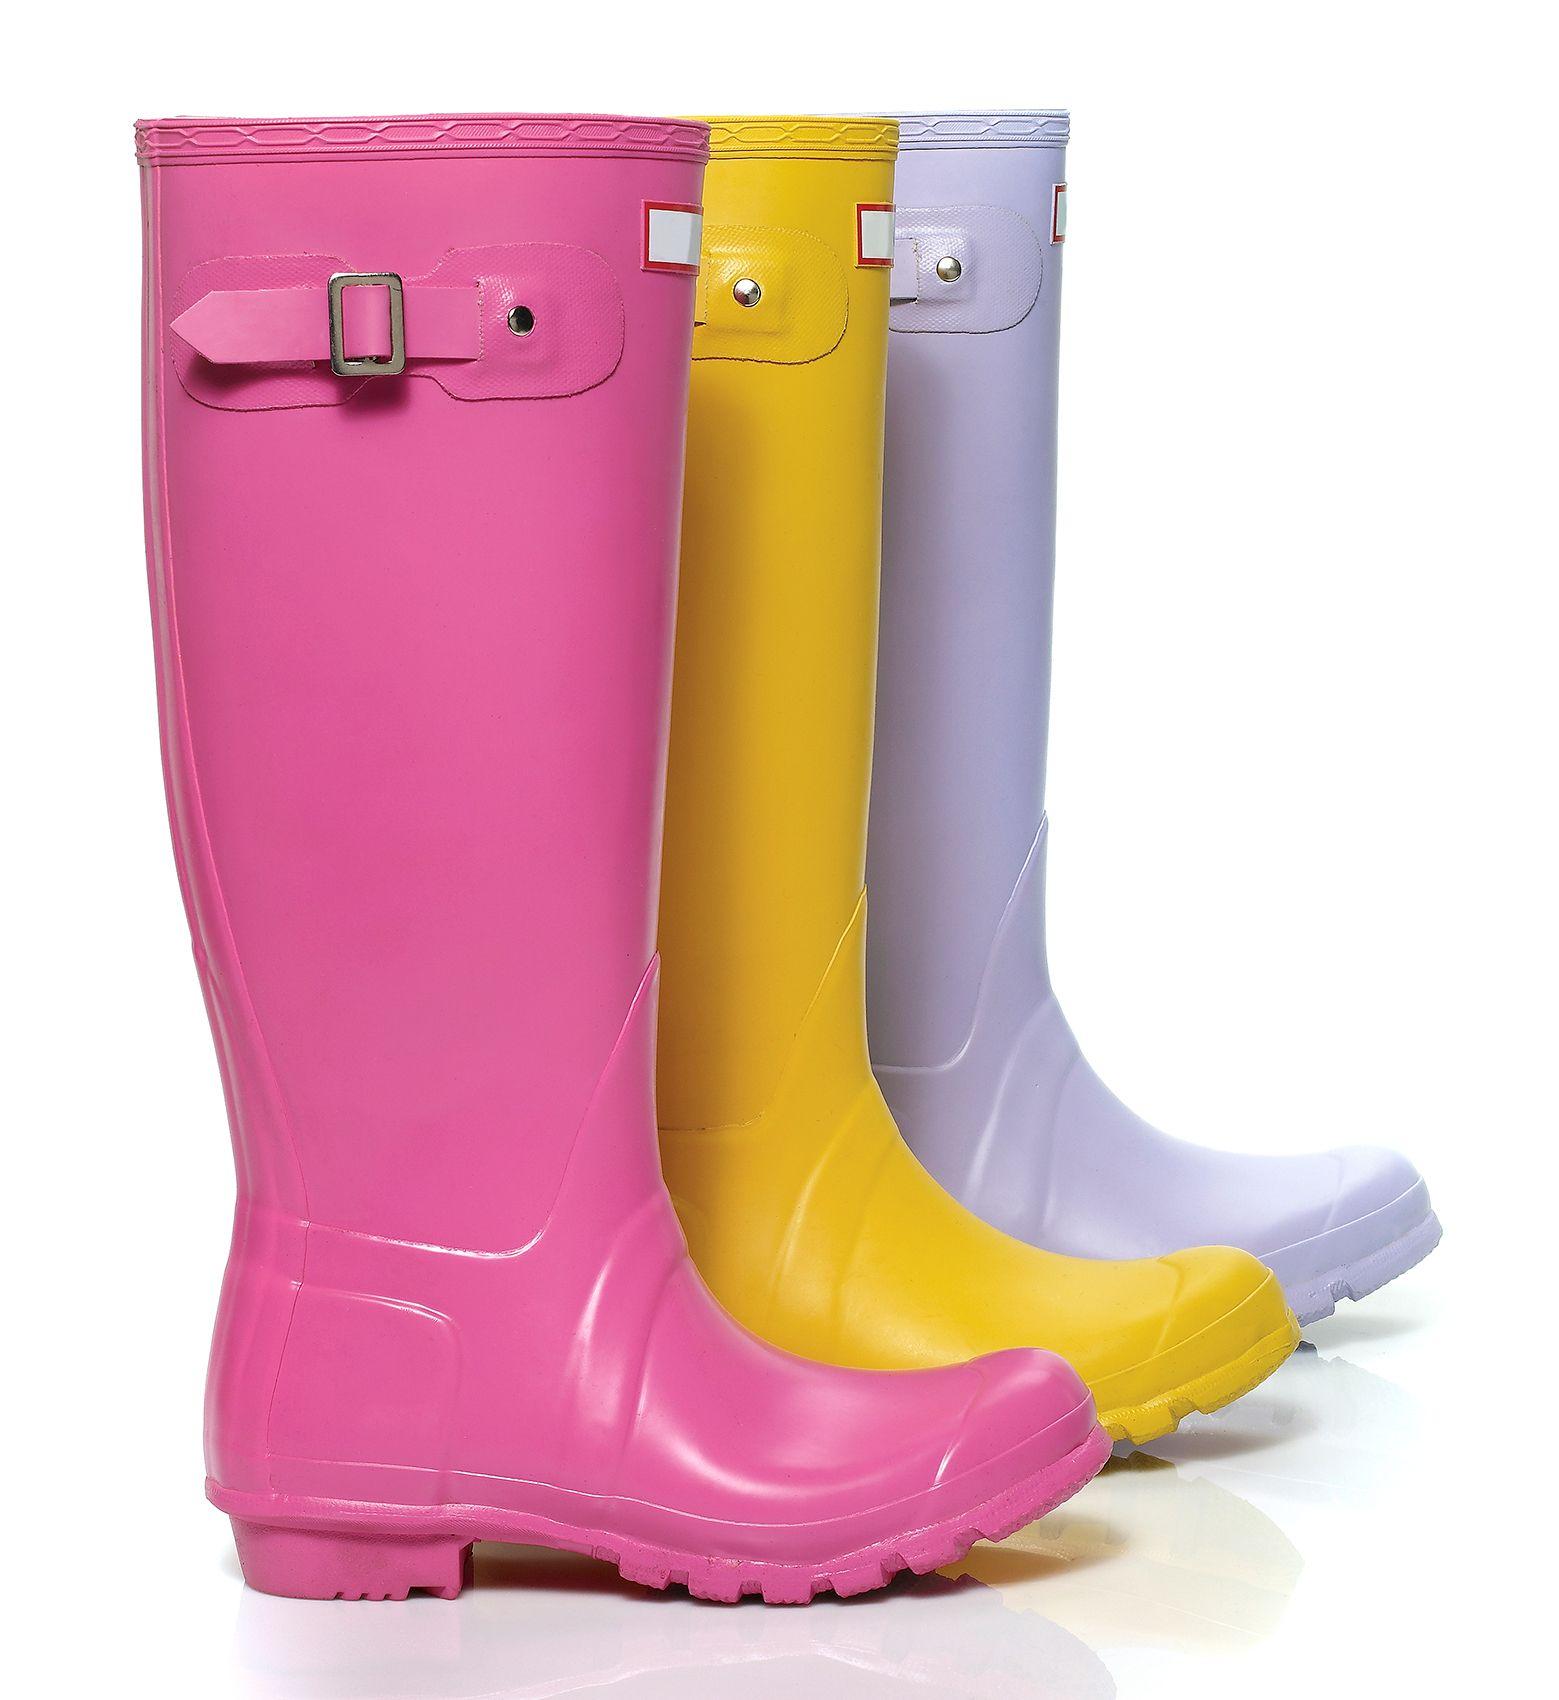 rain-boots-2.jpg